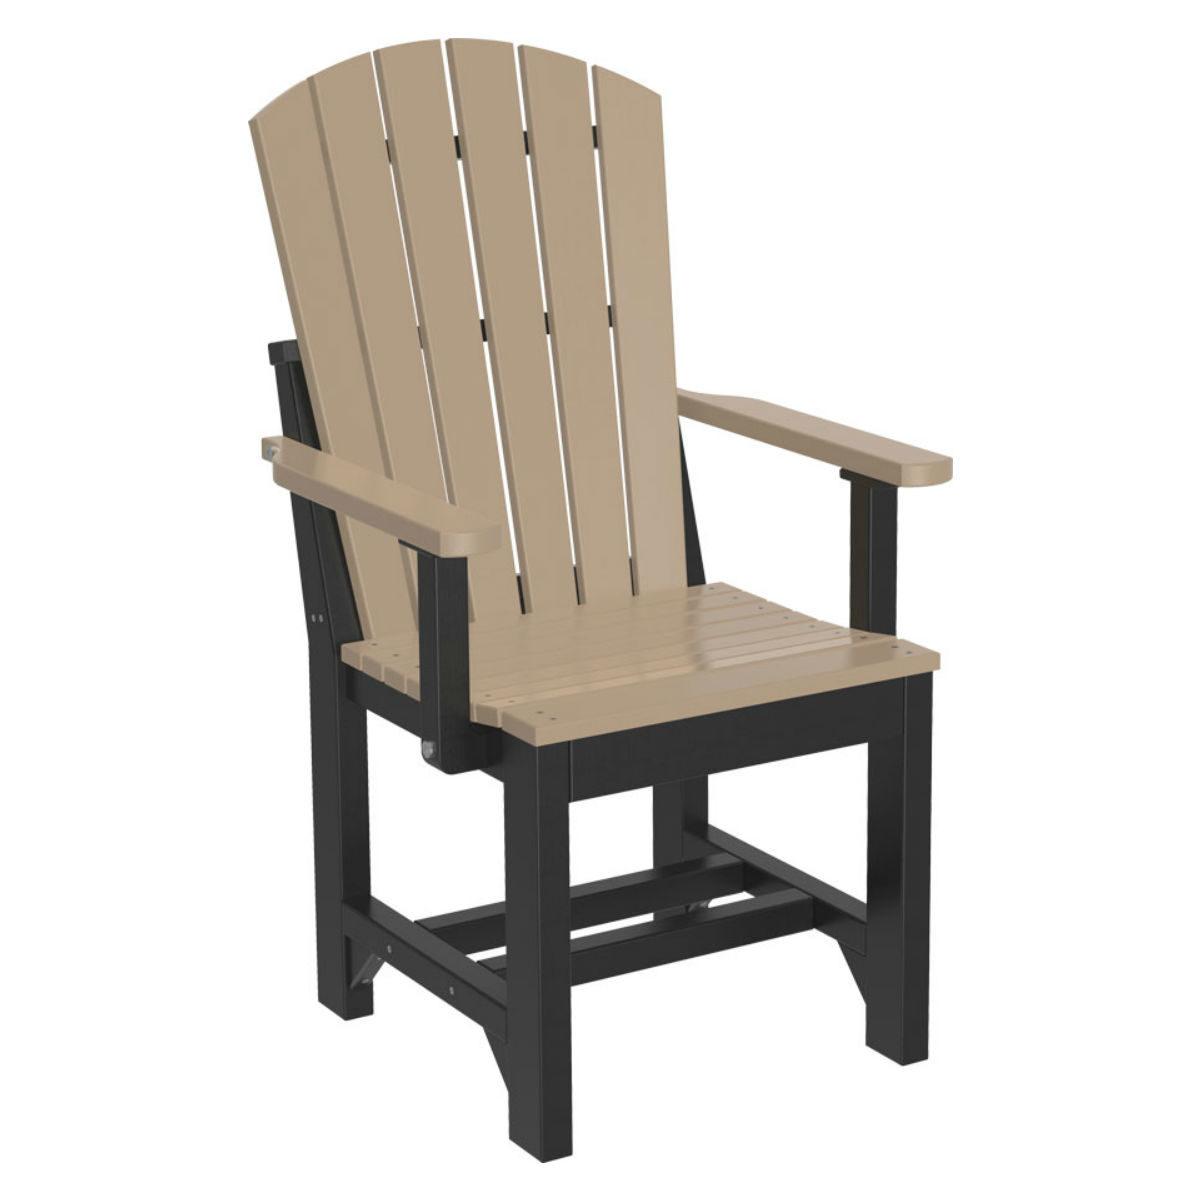 Adirondack Captain Dining Chair - Weatherwood & Black